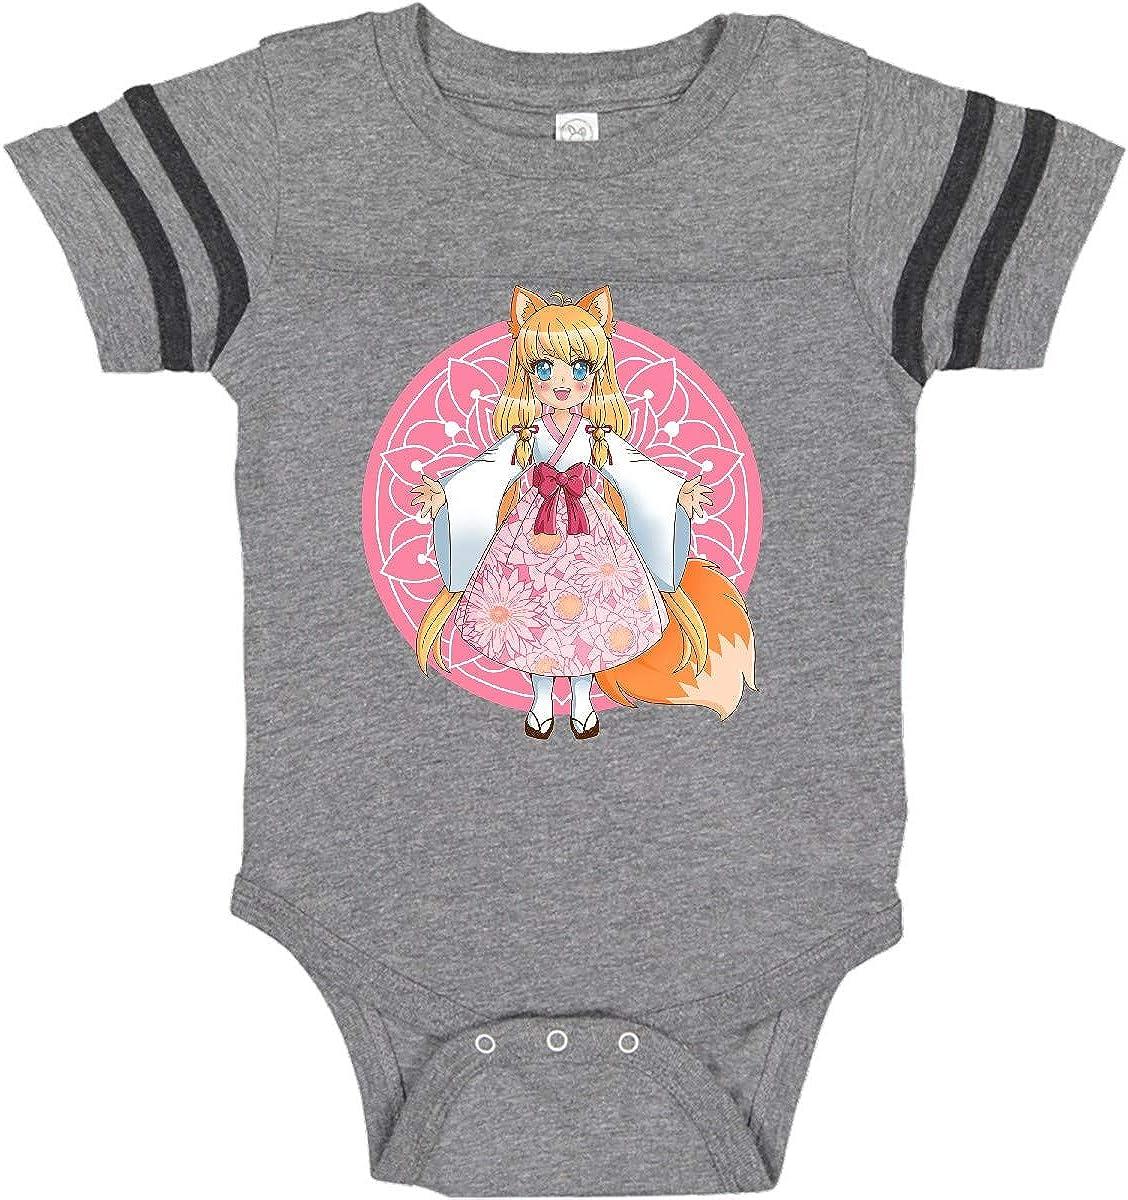 TooLoud Blessed Yule Emblem Infant T-Shirt